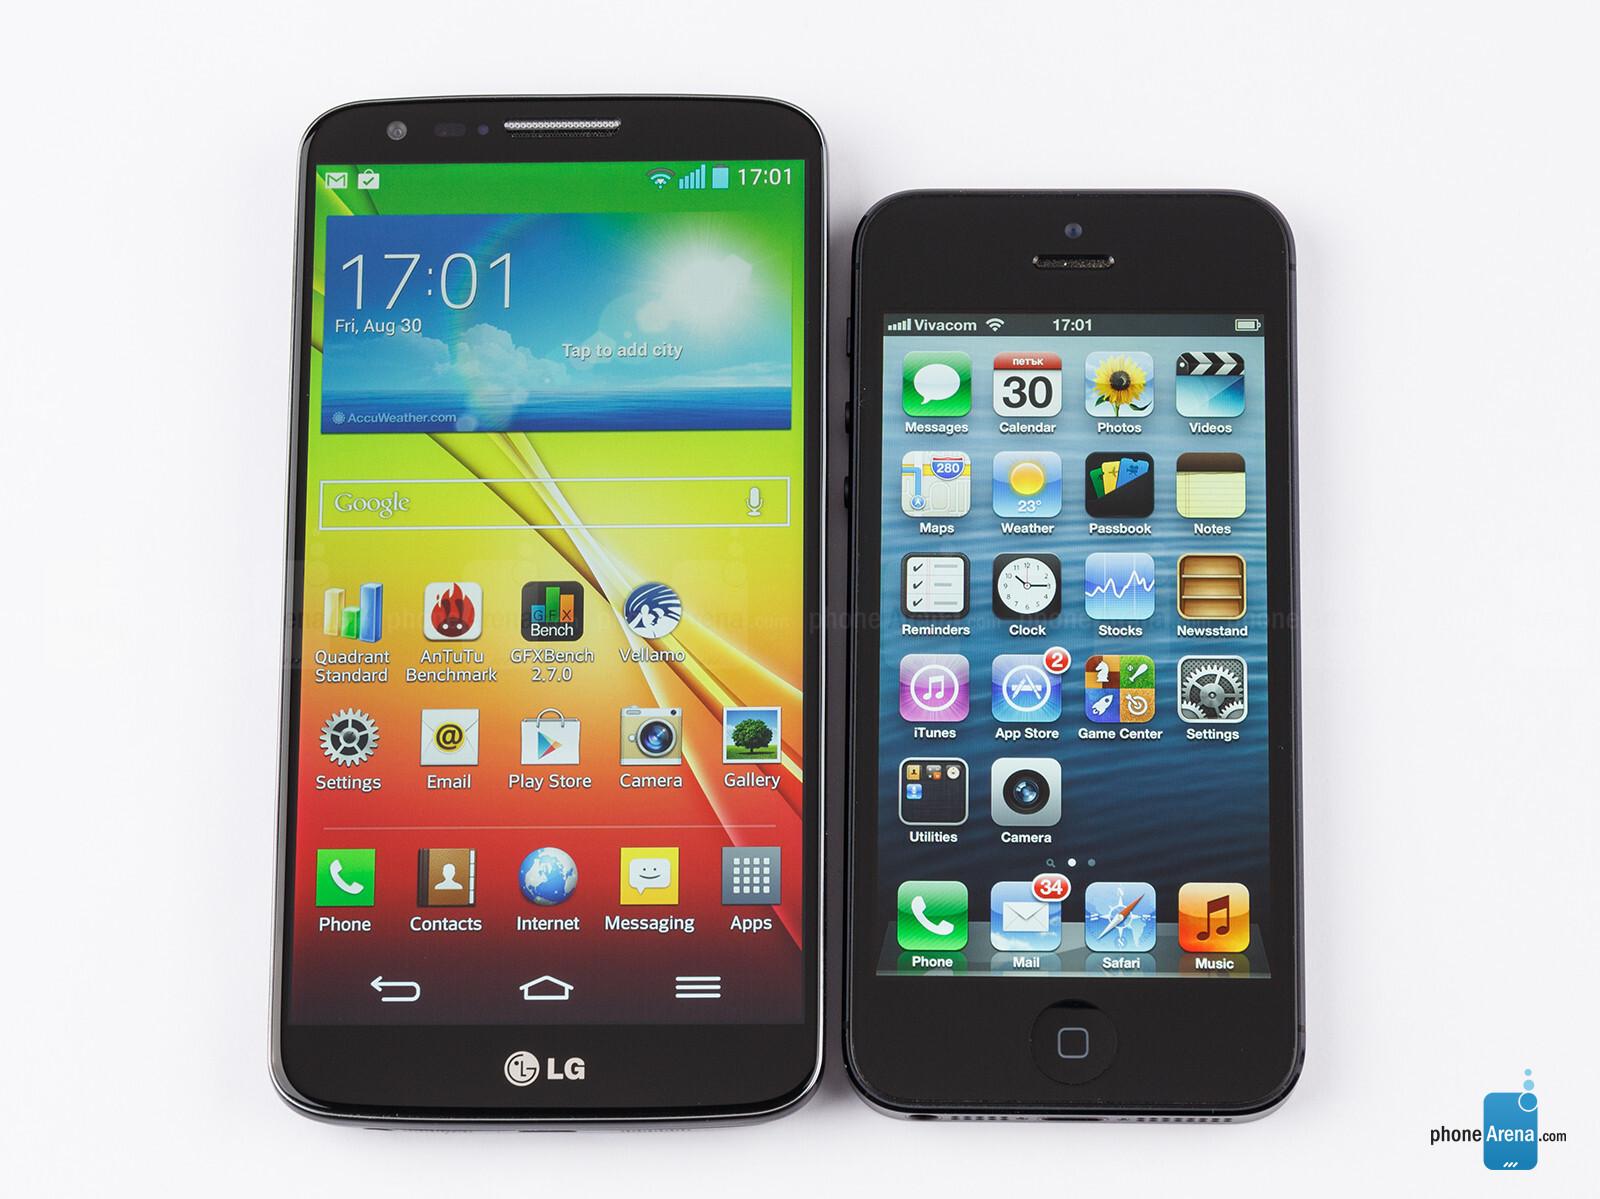 LG G2 vs Apple iPhone 5